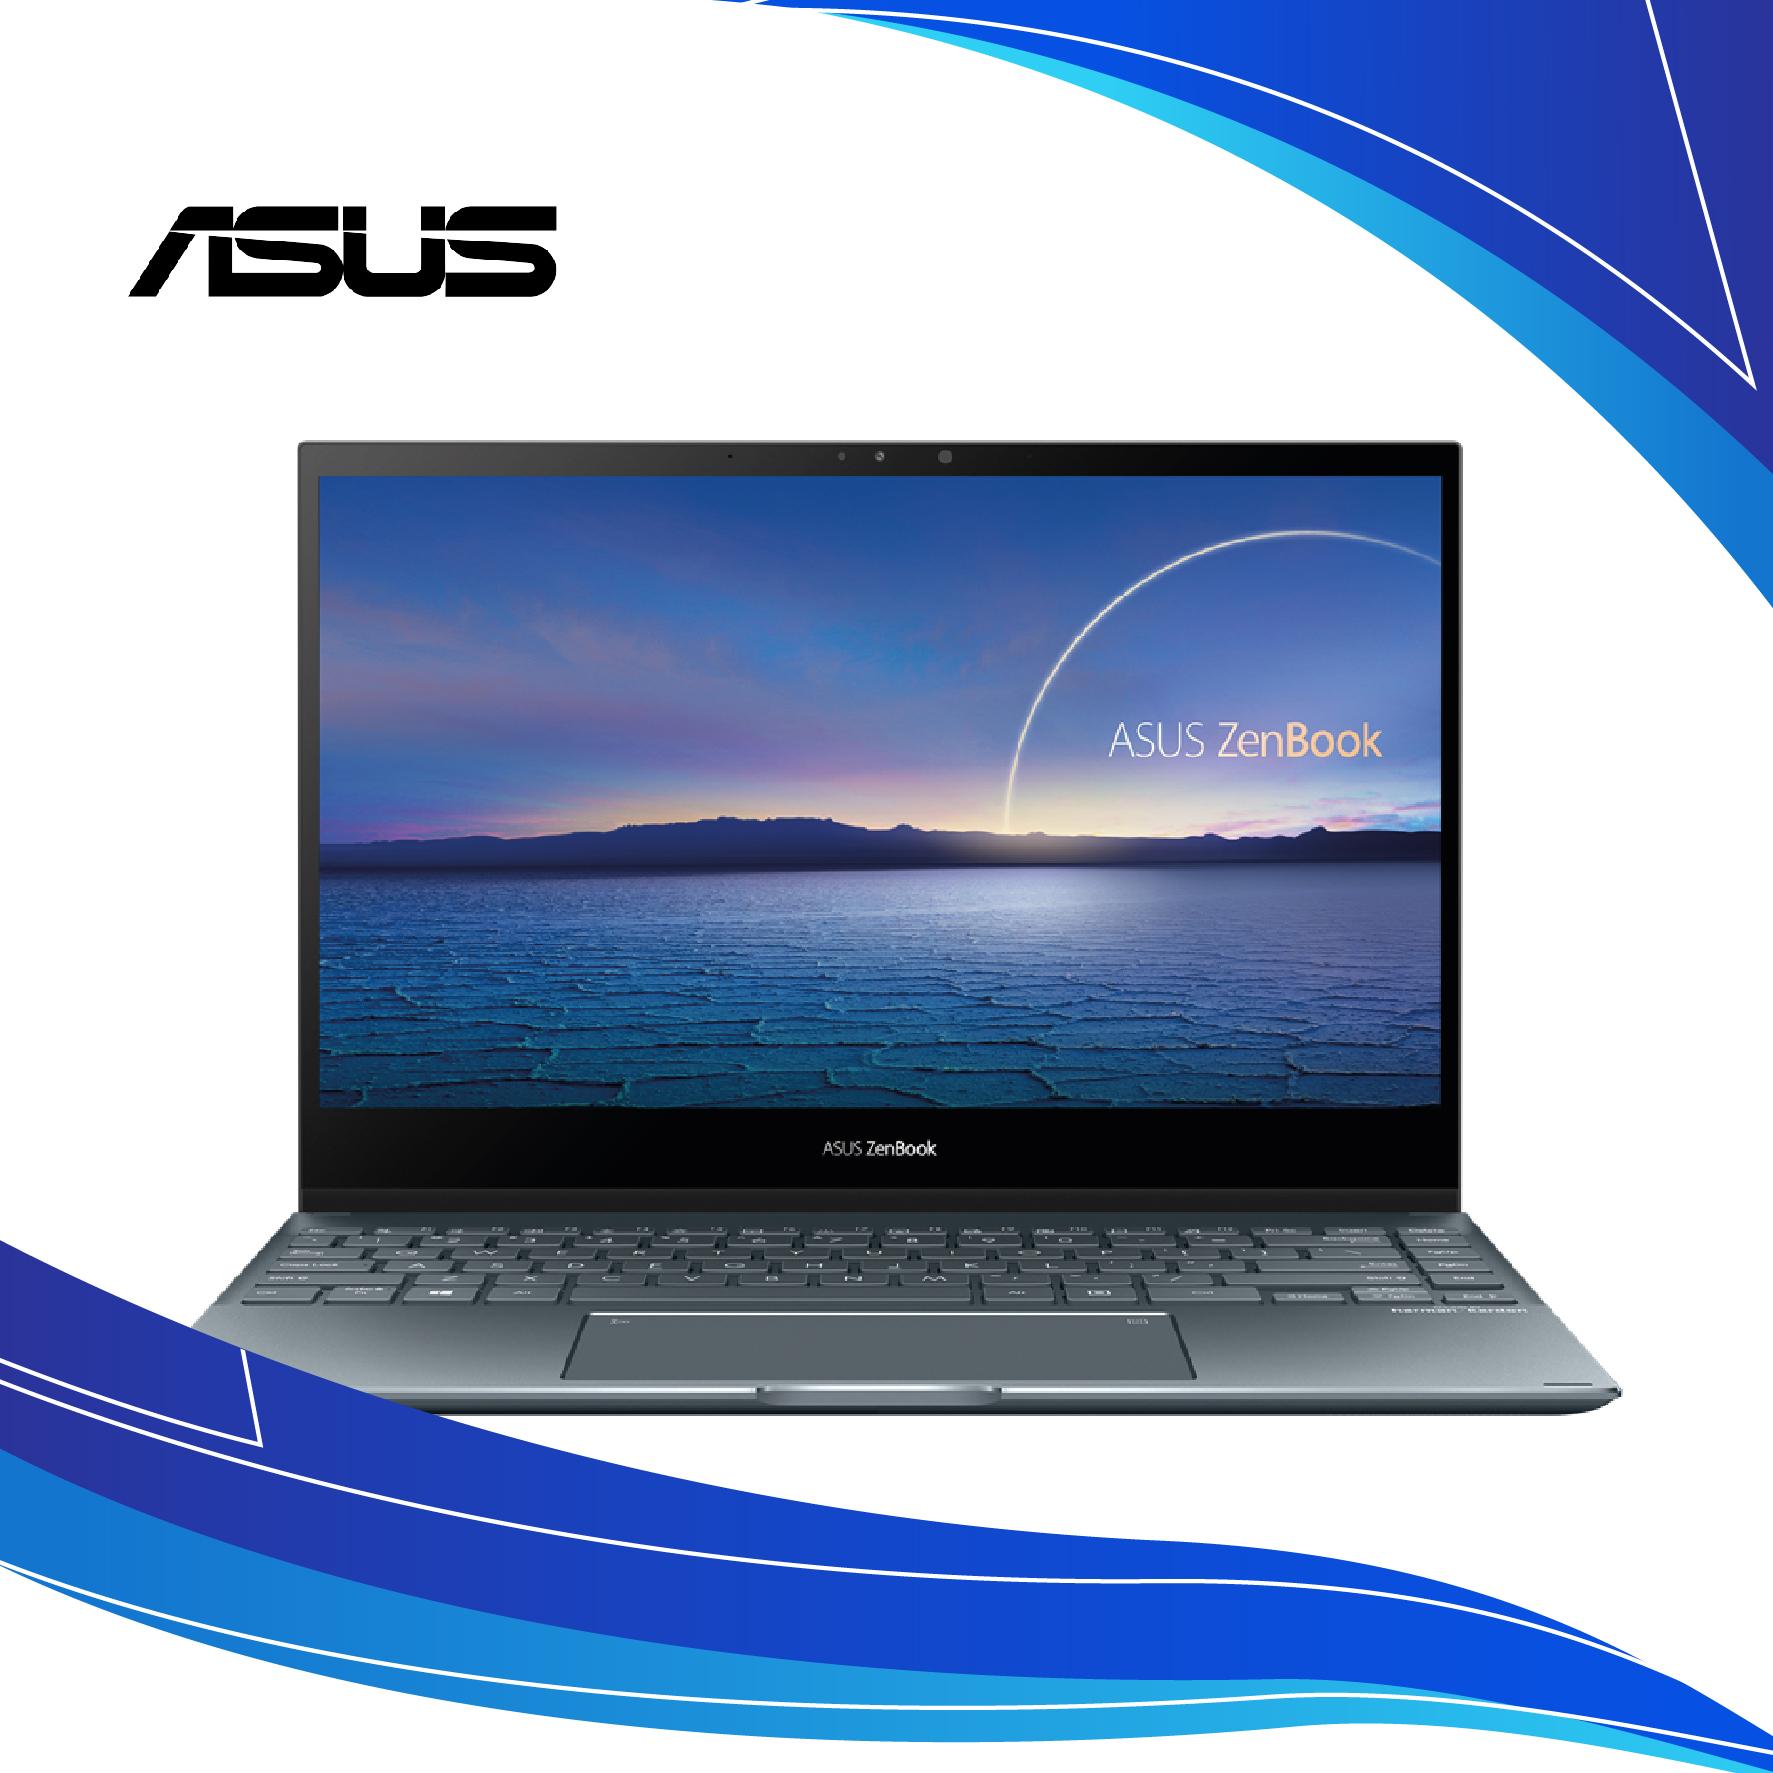 Portátil Asus Zenbook Flip 13   asus portatiles al costo   portatiles en promocion asus colombia